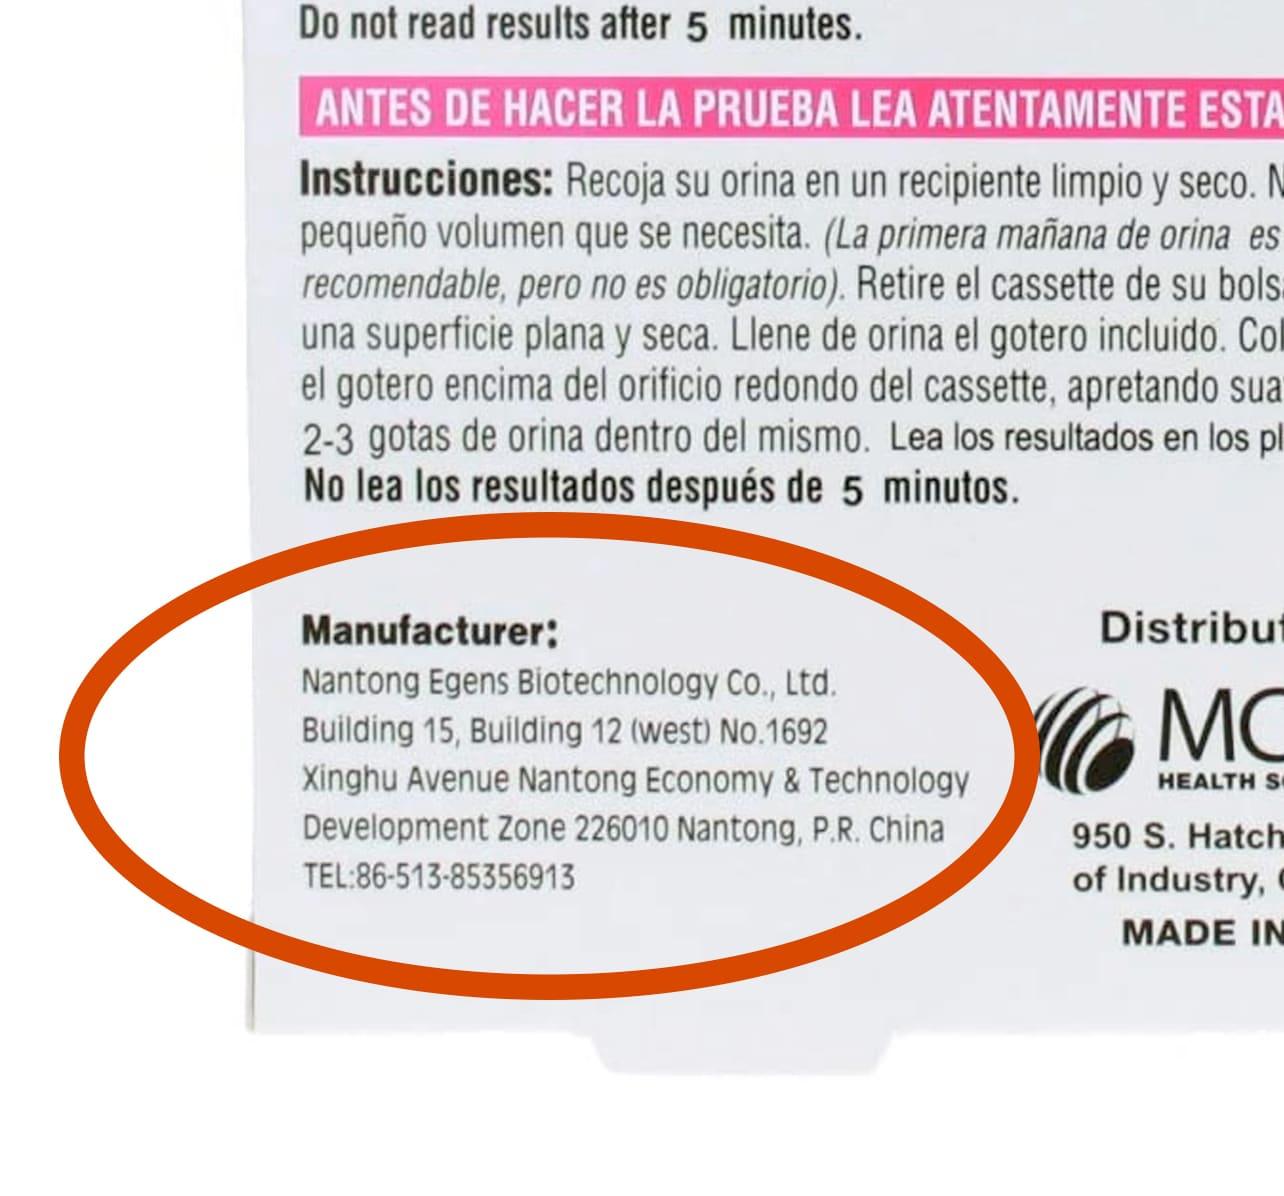 Paraid Pregnancy Test manufacturer